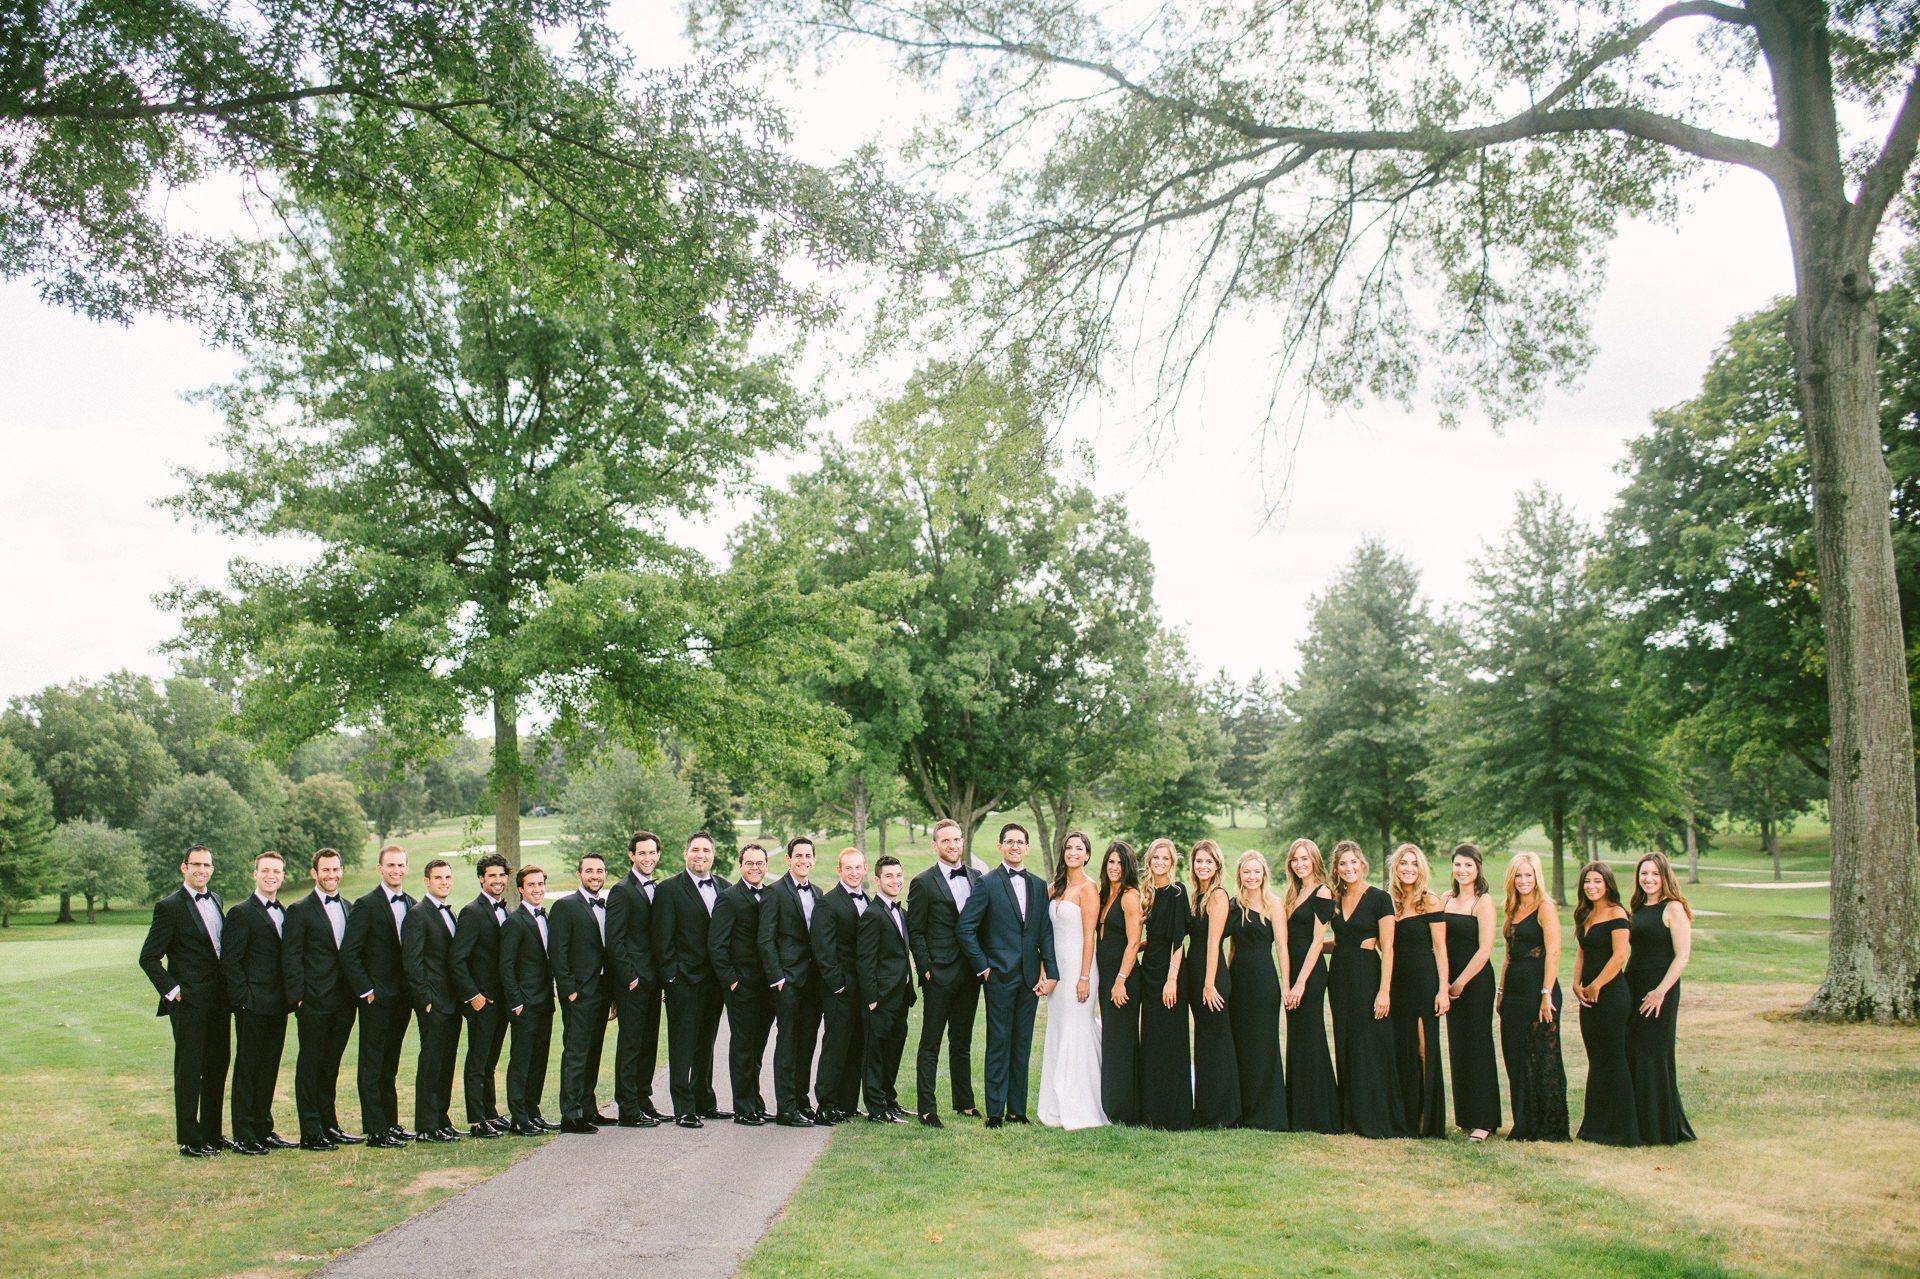 Beechmont Country Club Wedding Photographer in Beachwood 1 36.jpg